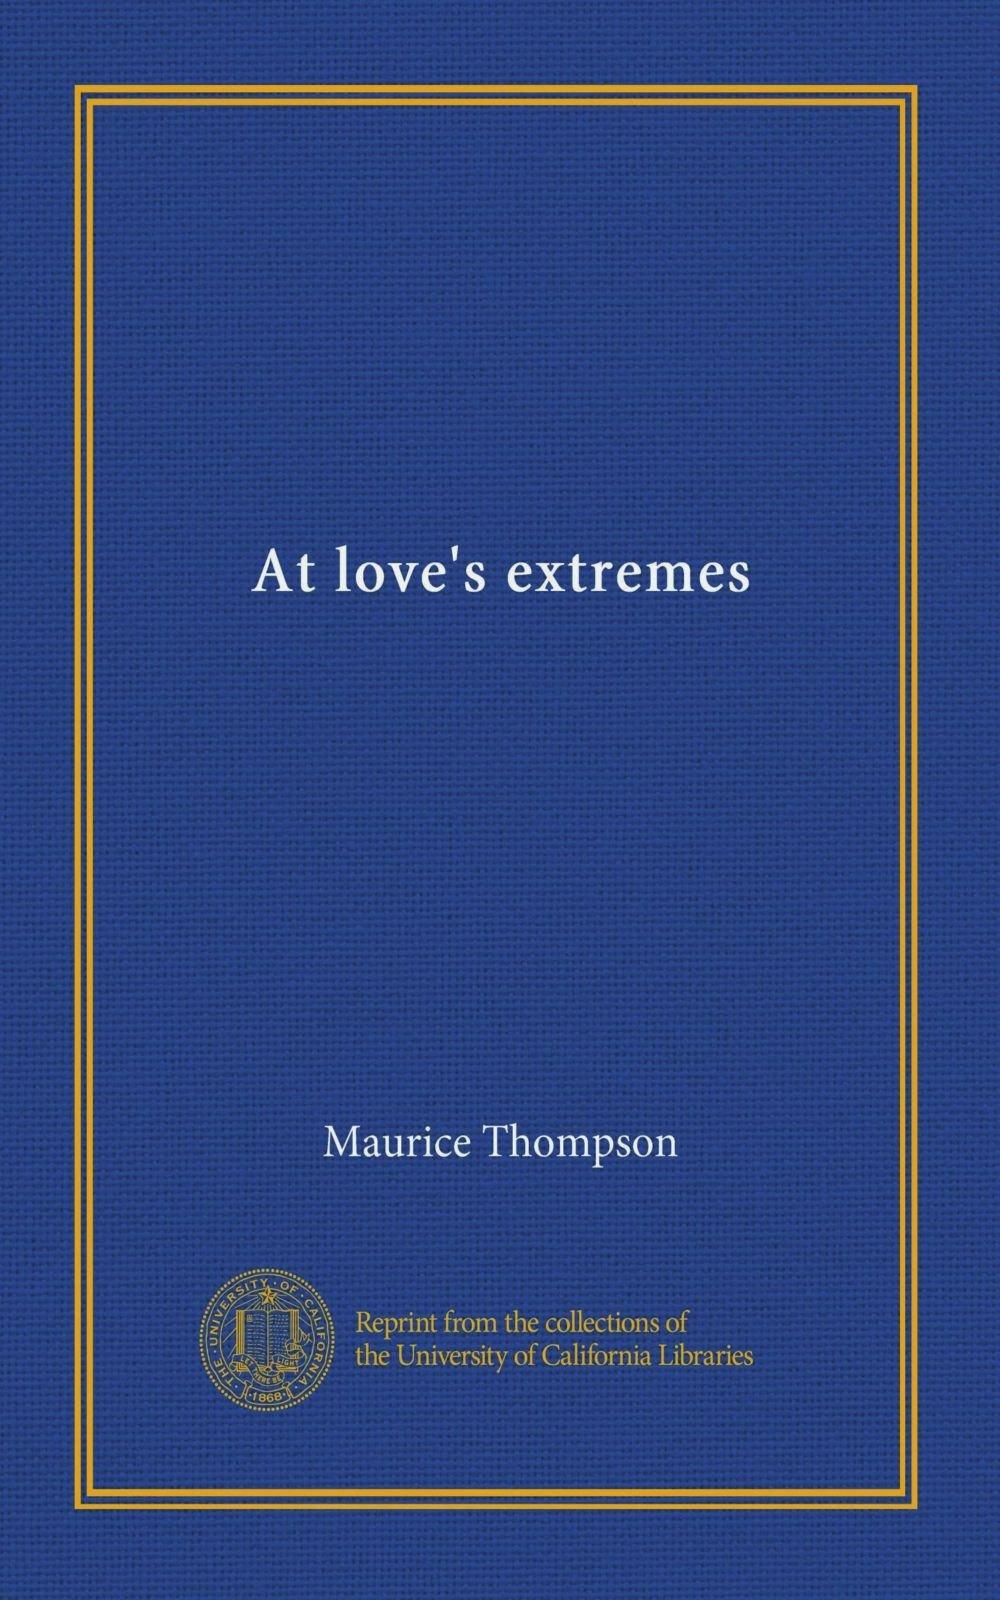 At love's extremes ebook